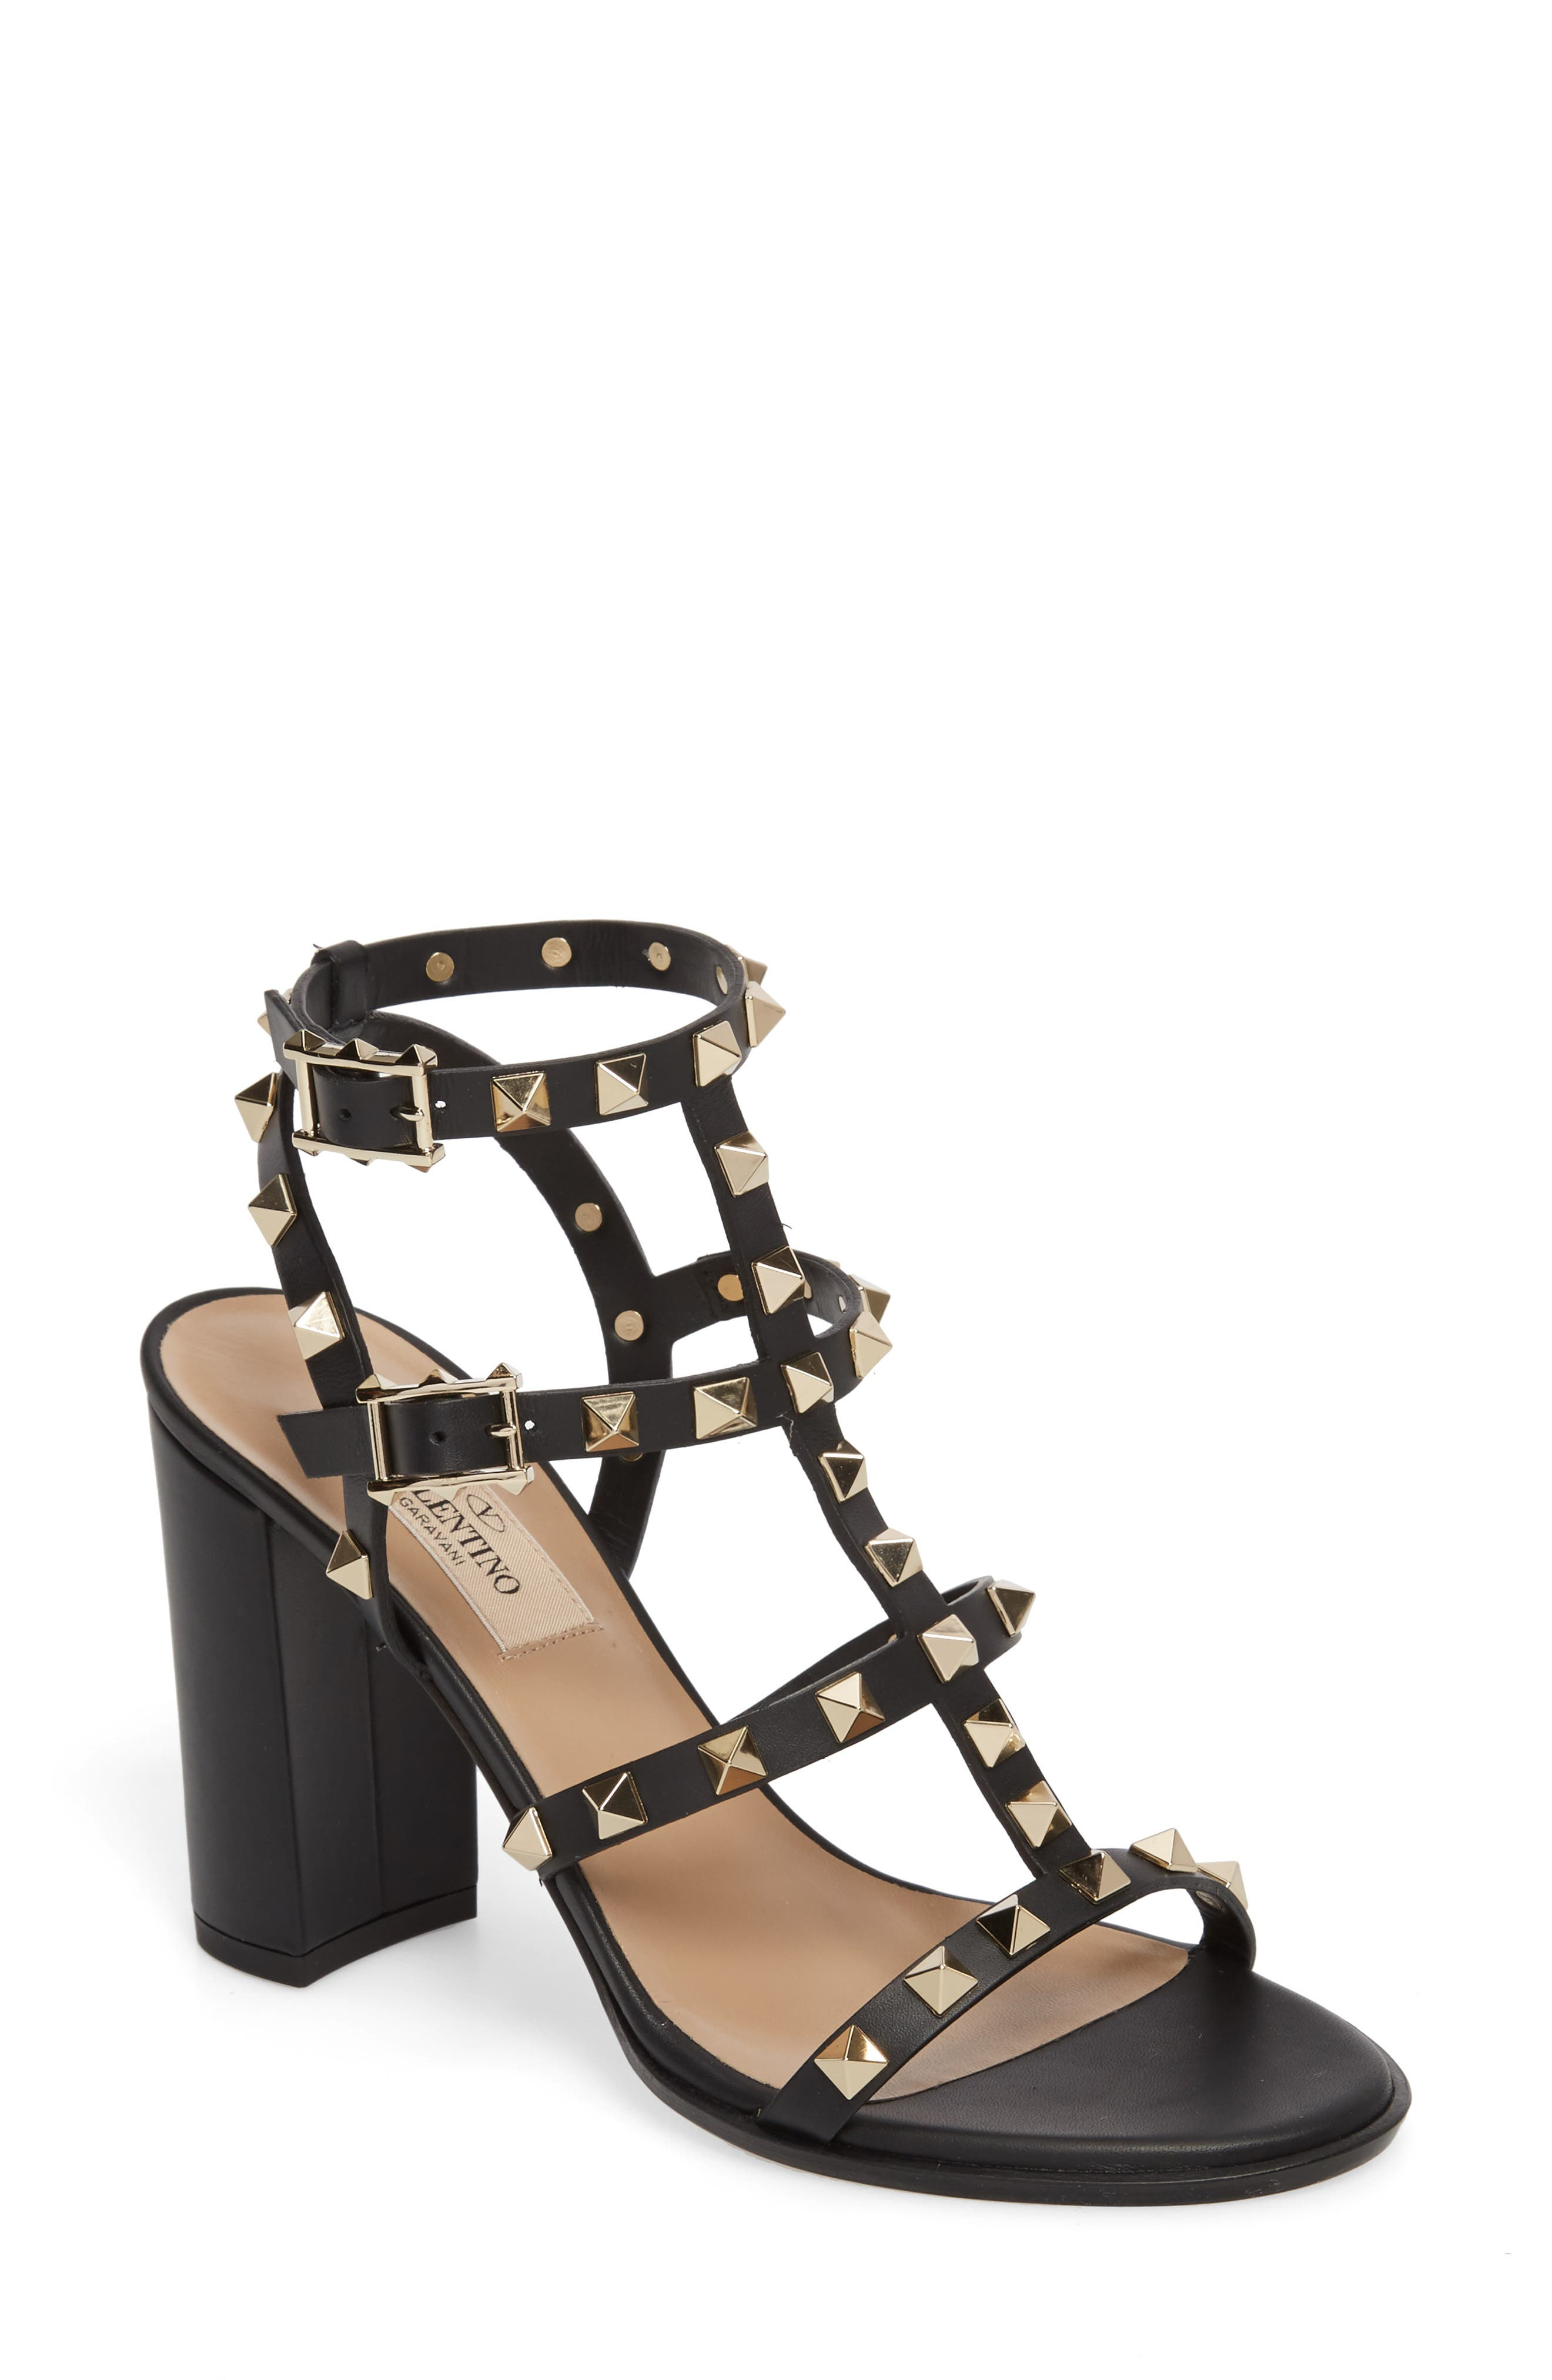 VALENTINO GARAVANI 'Rockstud' T-Strap Sandal, Main, color, 002